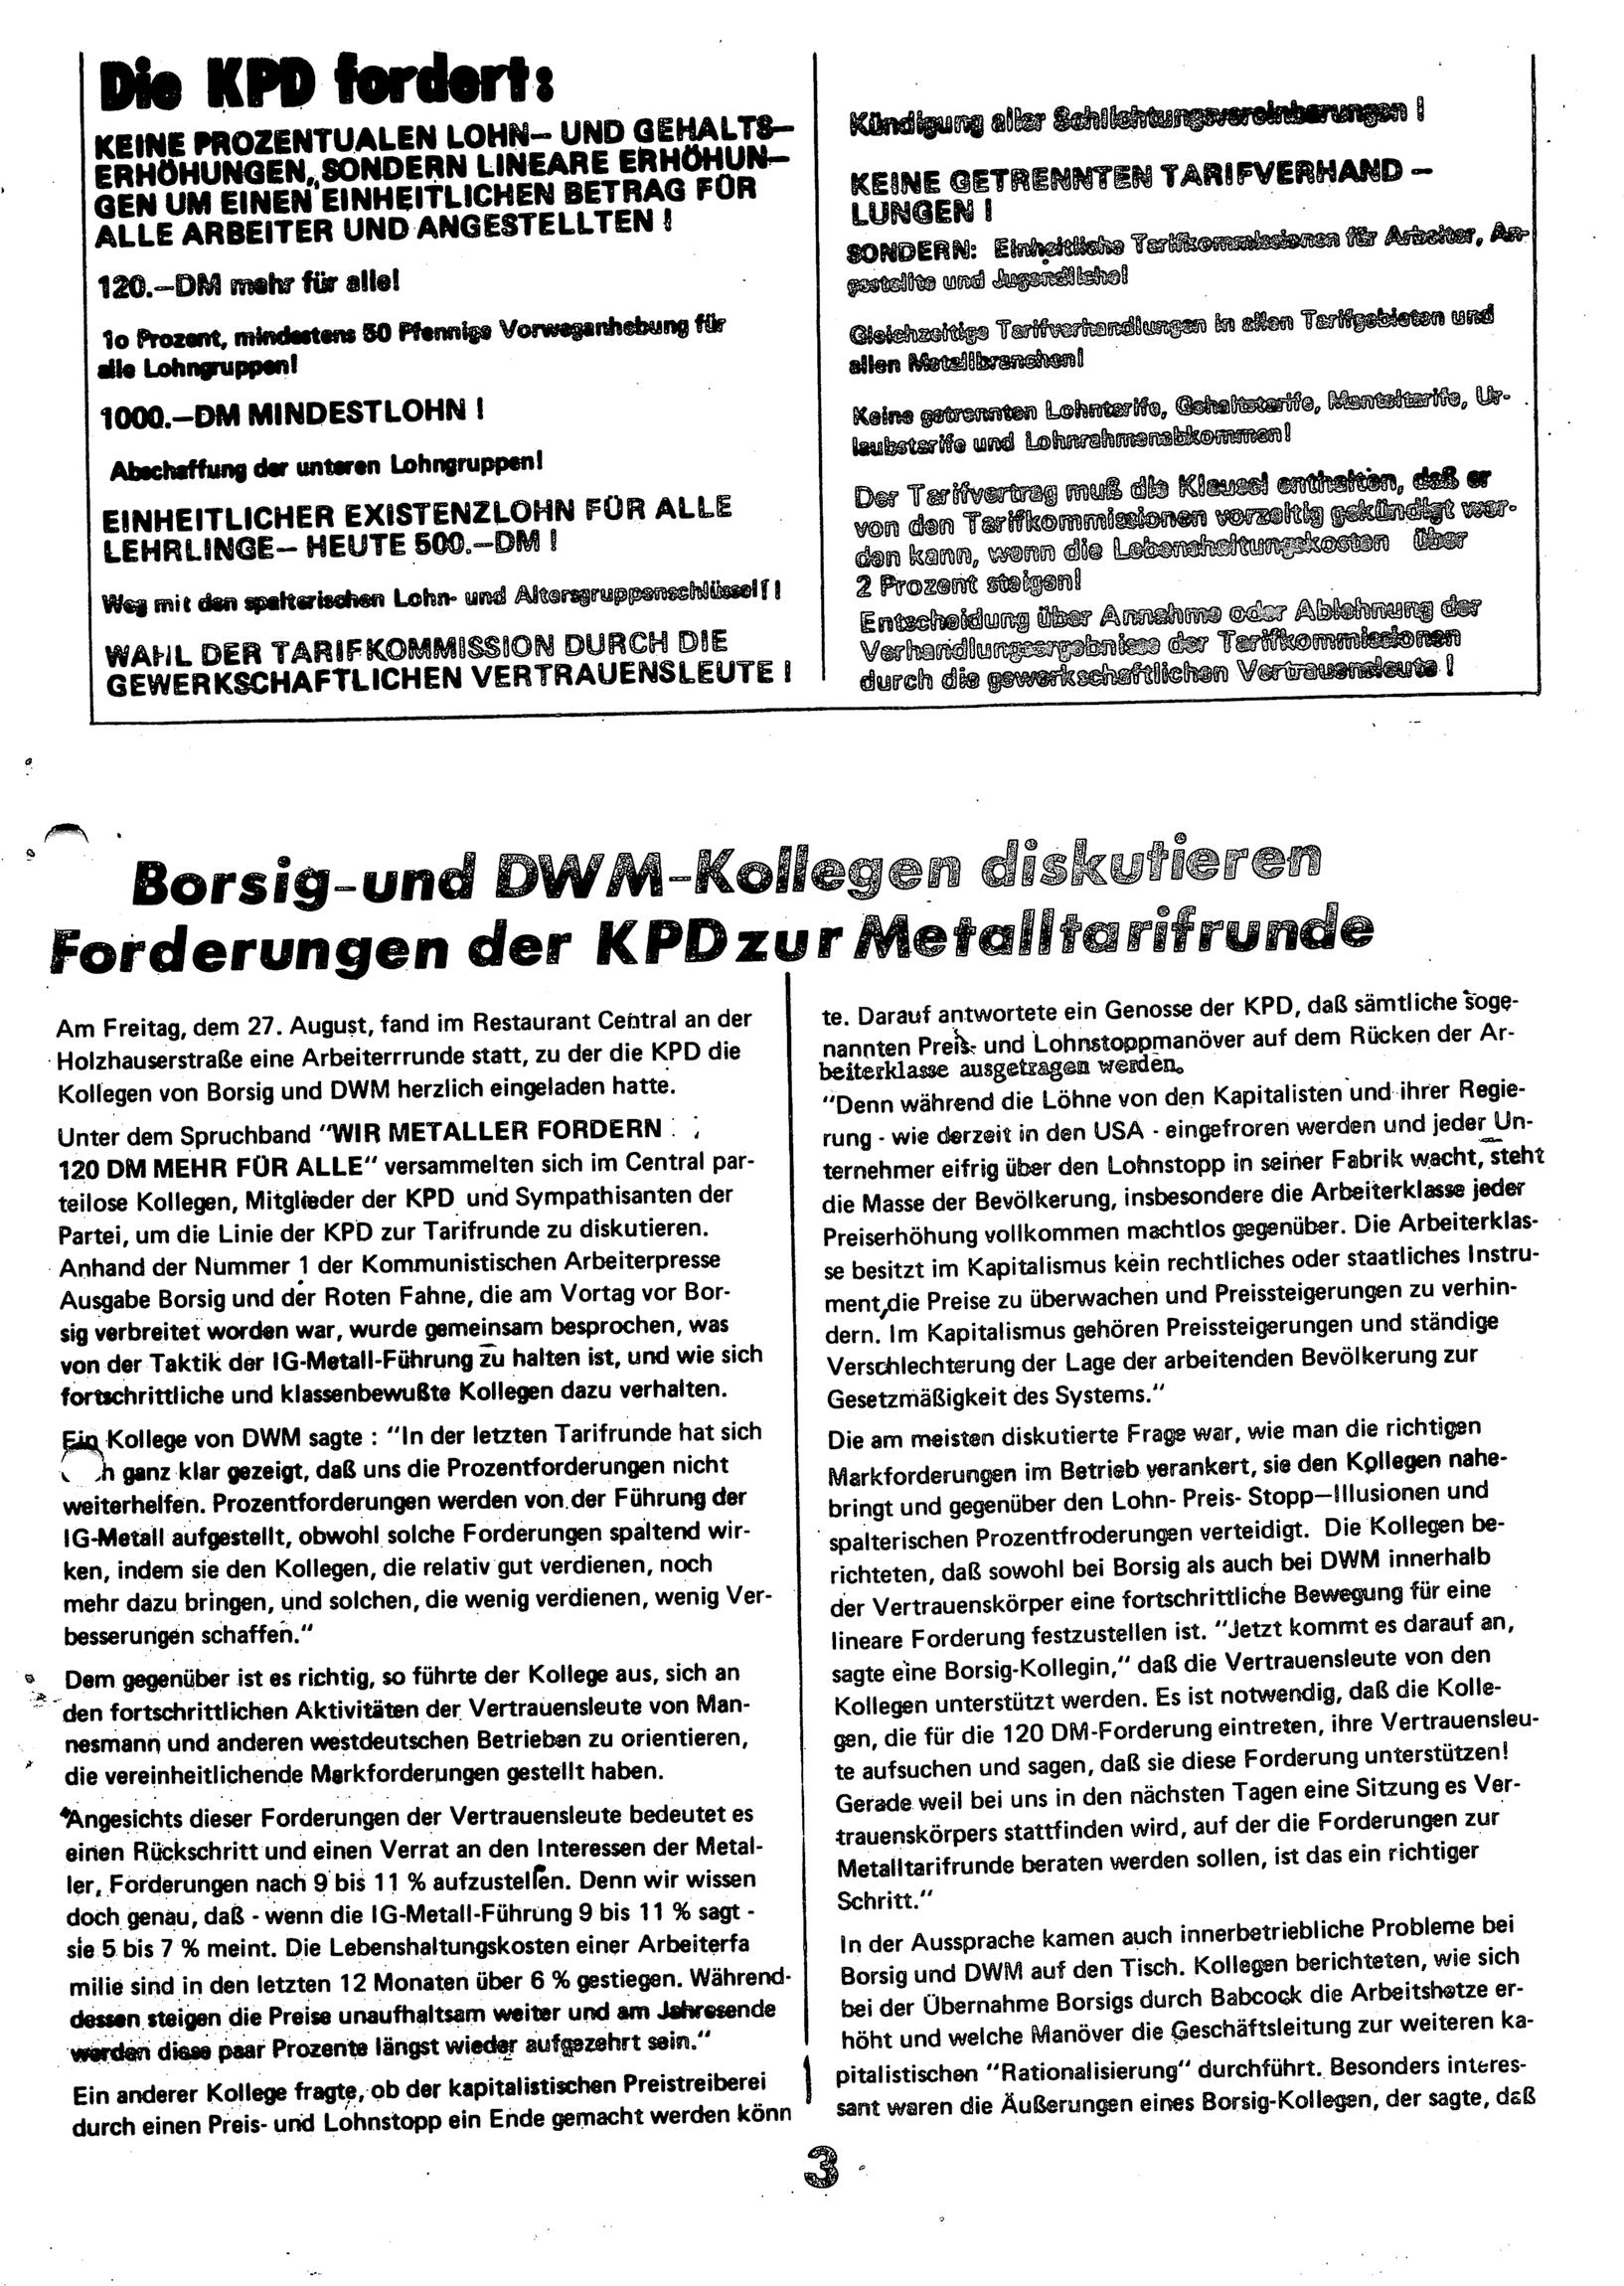 Berlin_Borsig304